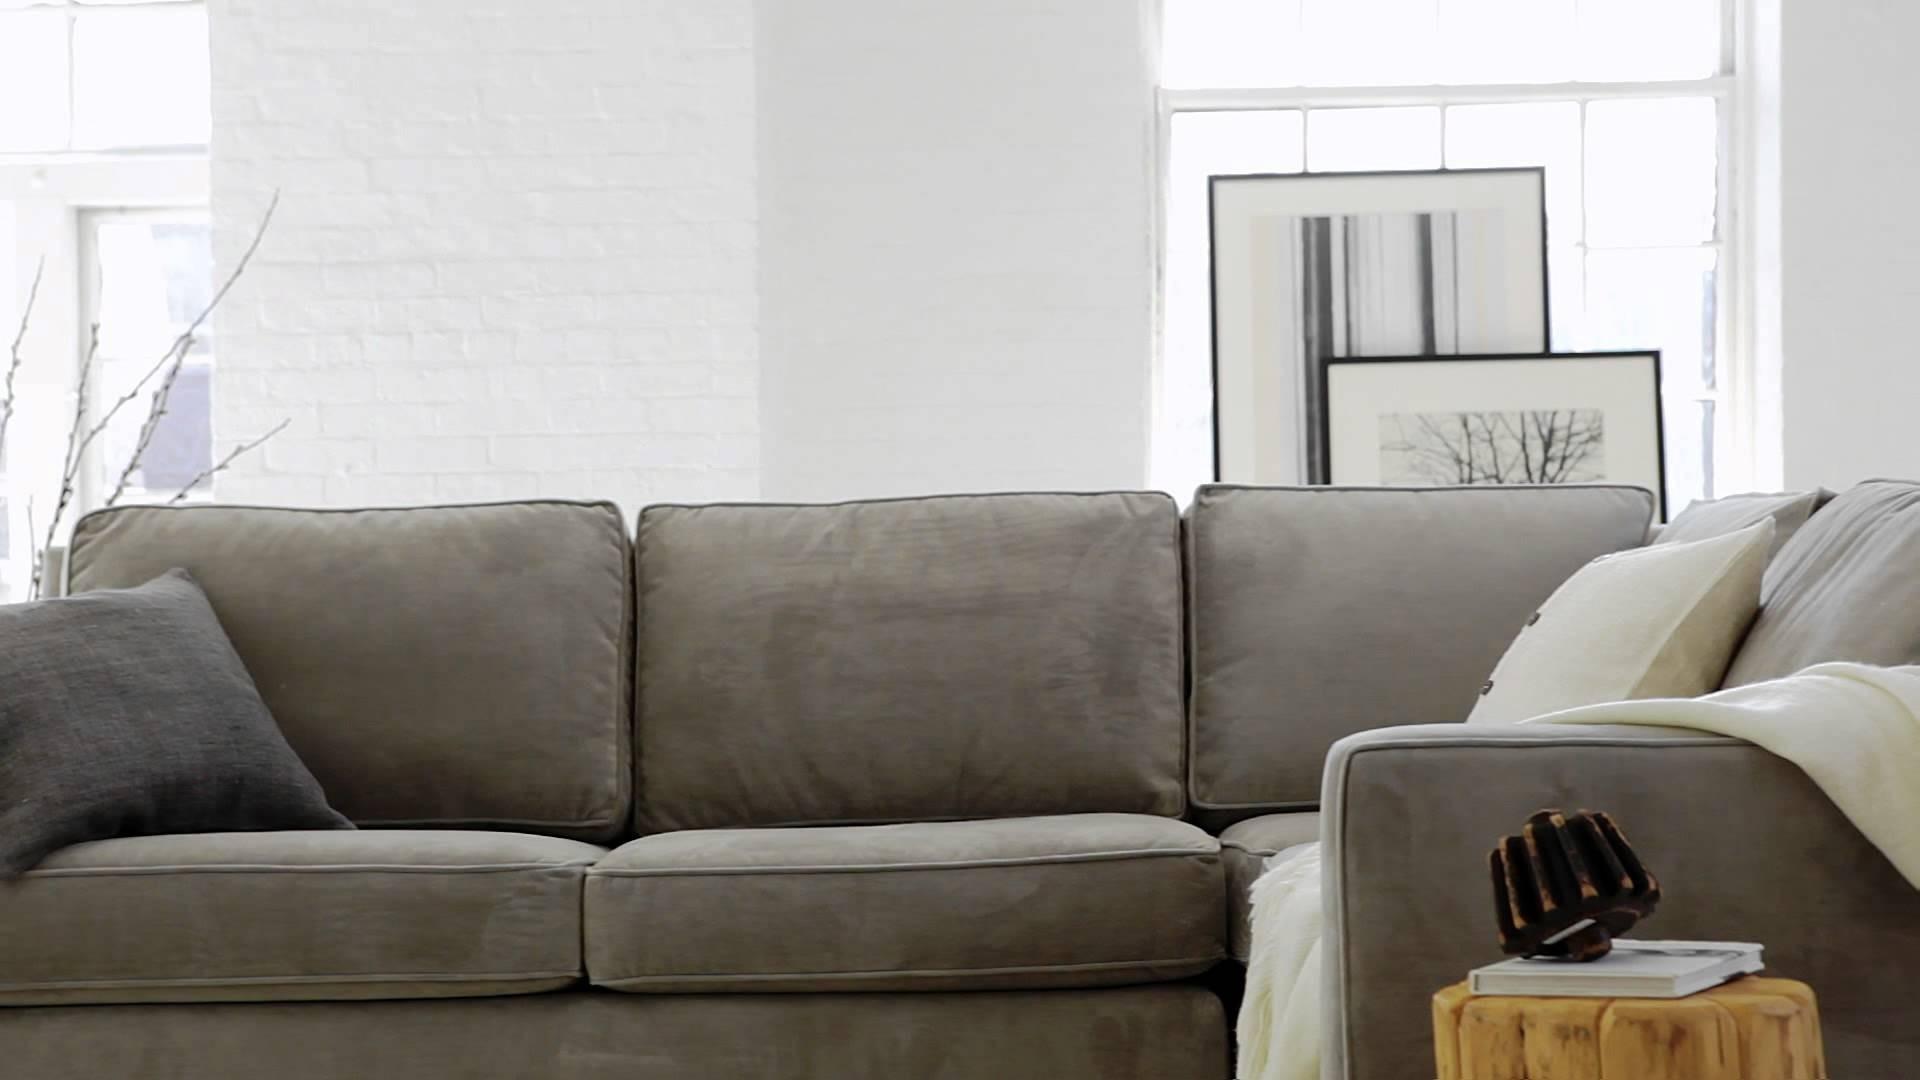 Fresh 3 Seat Sectional Sofa West Elm – Mediasupload Intended For West Elm Sectional Sofas (Image 2 of 10)